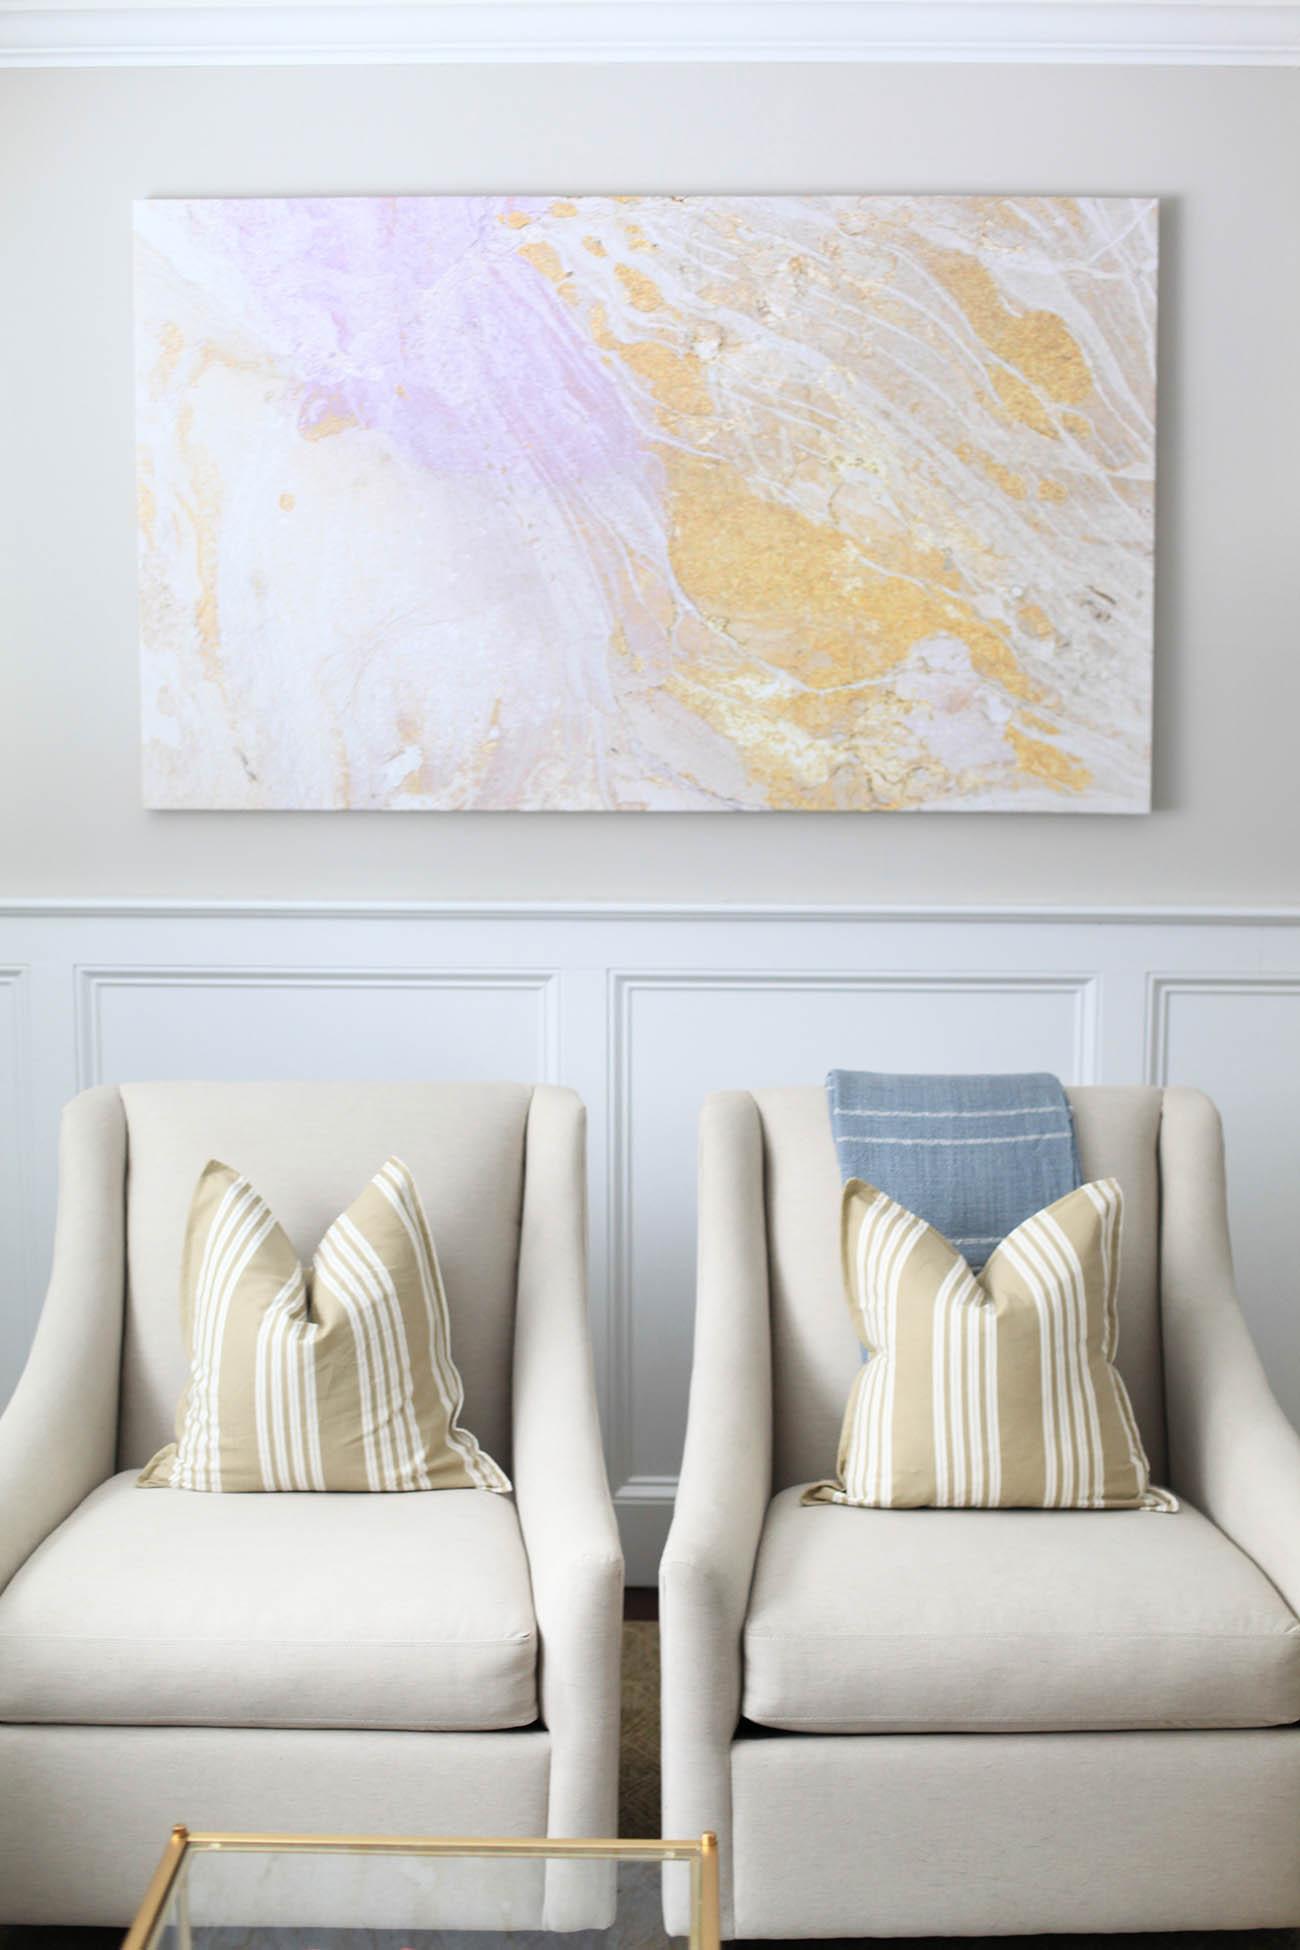 Living Room Refresh with Birch Lane : Abstract Art Living Room from lemonstripes.com size 1300 x 1950 jpeg 185kB